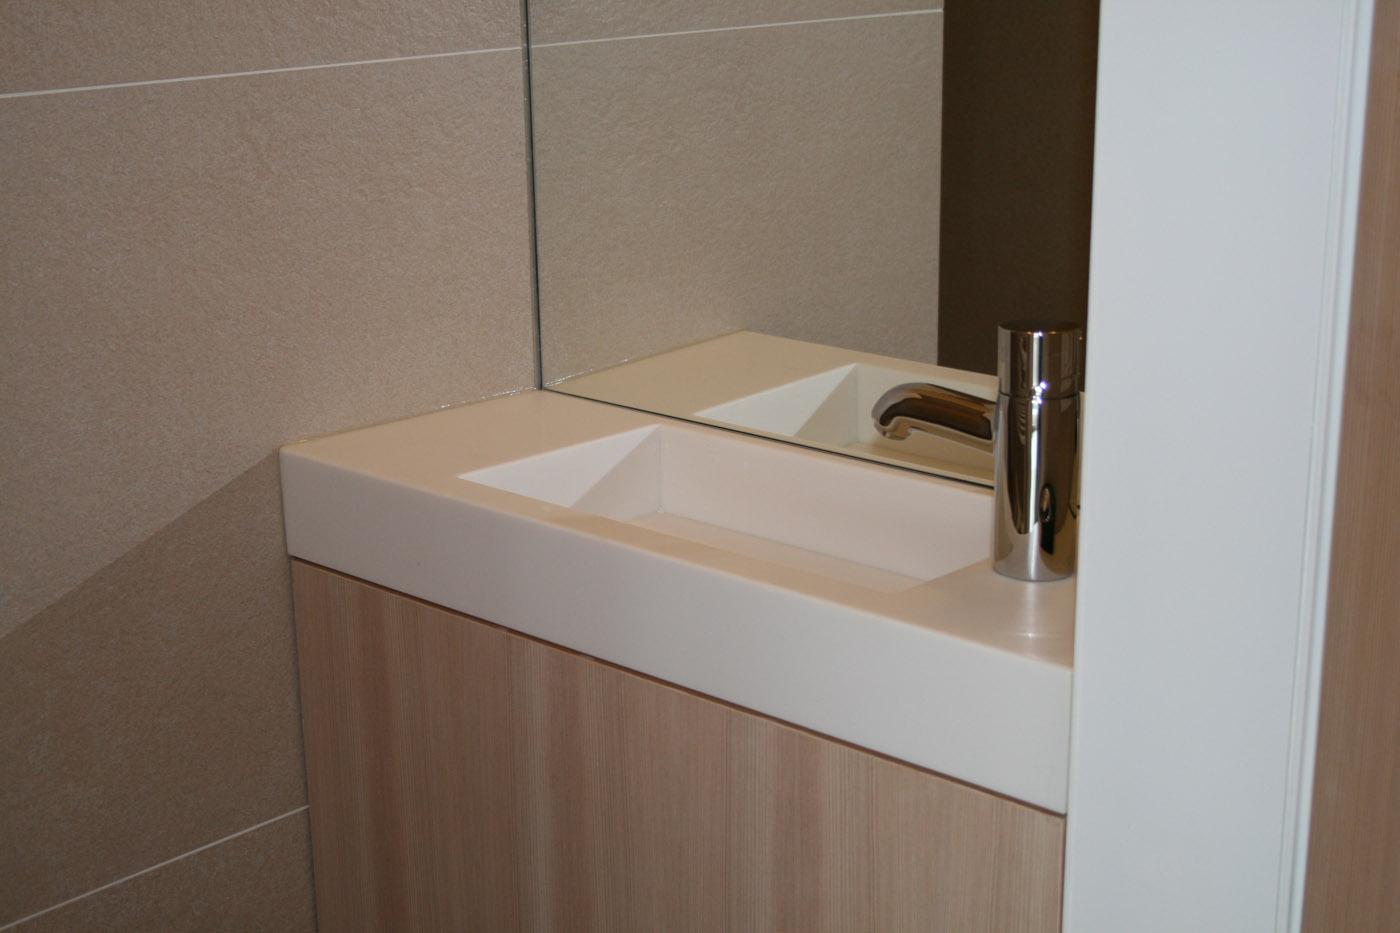 kwaliteit ikea badkamer